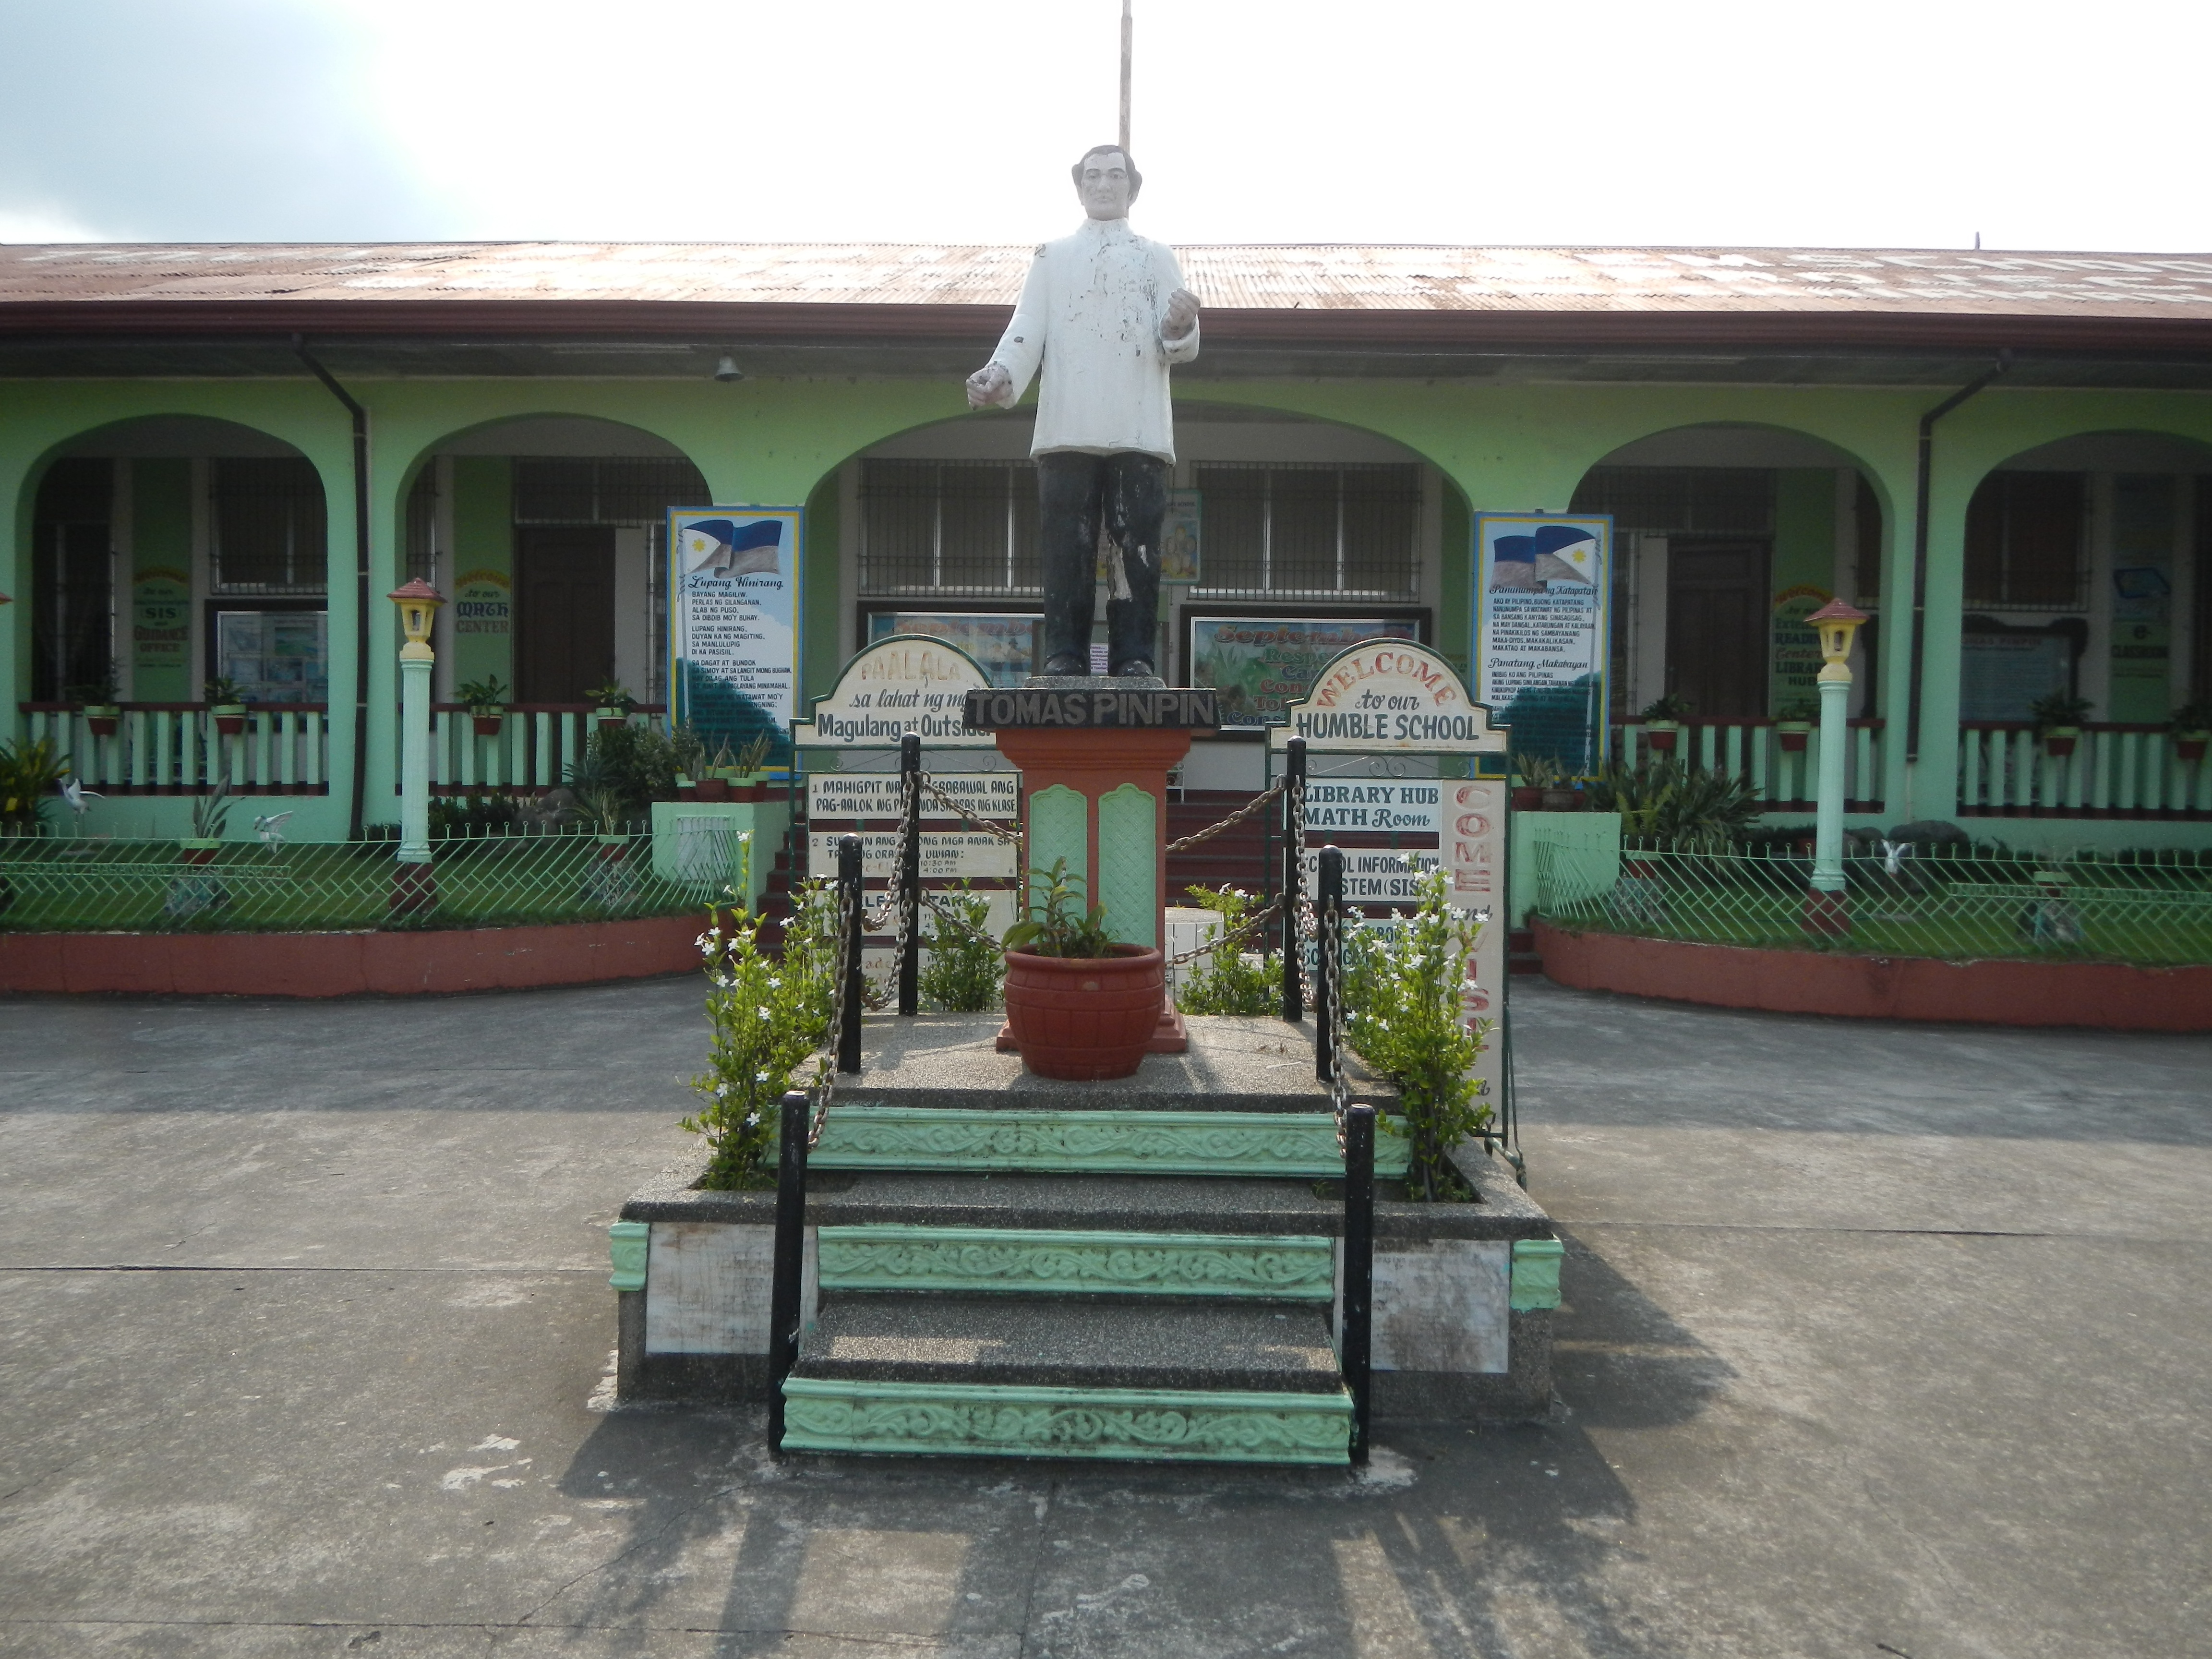 File:09747jfKaparangan Gabon Omboy School Roads Abucay